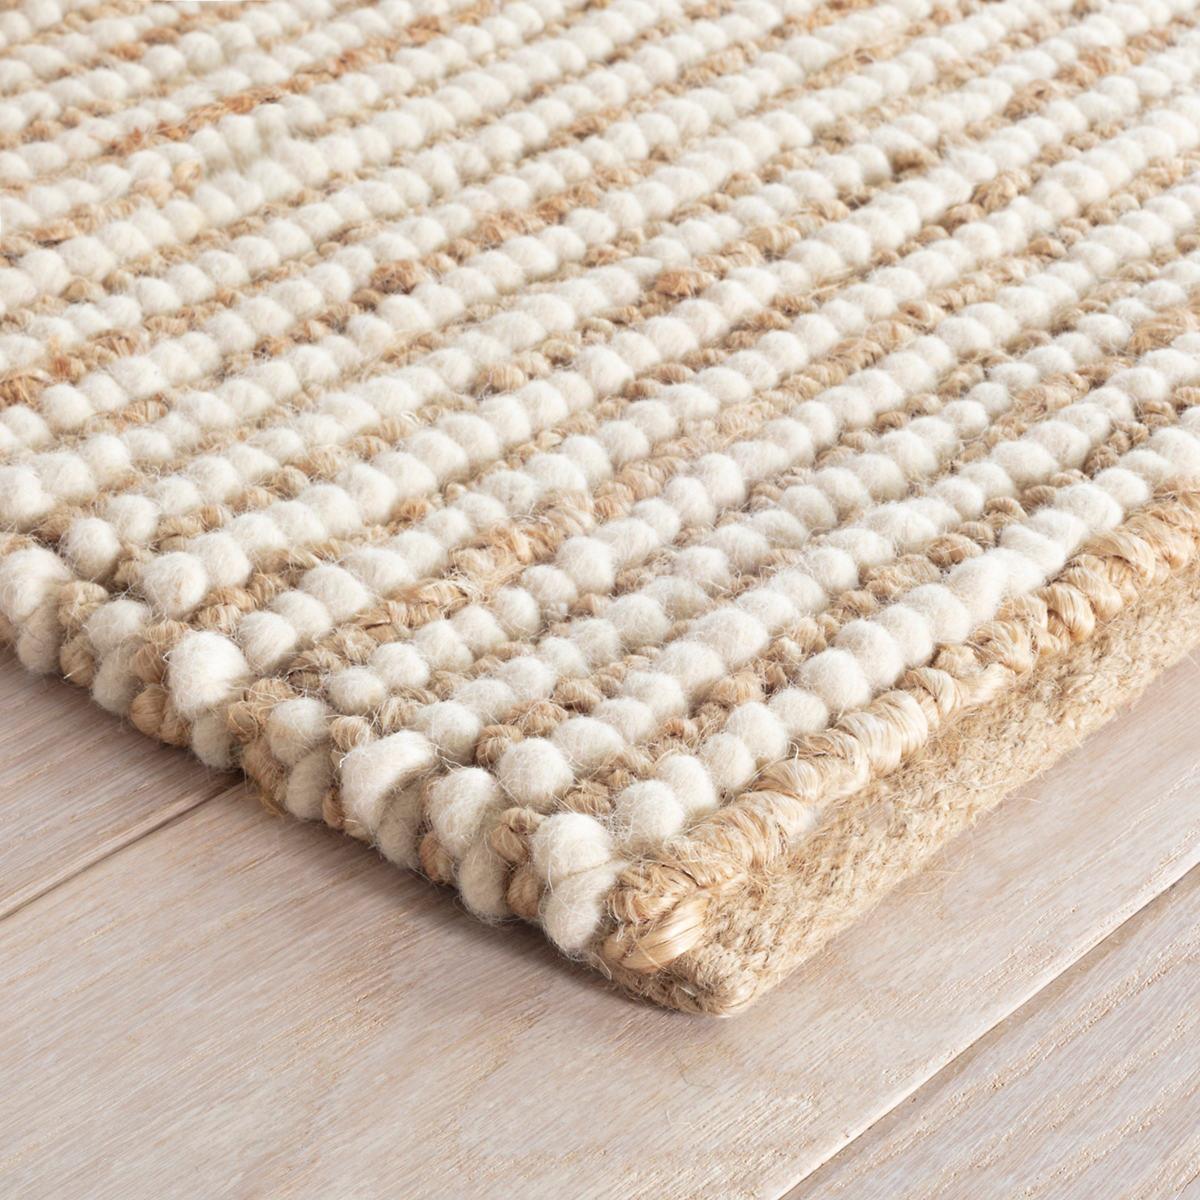 Twiggy Natural Woven Wool Jute Rug Dash Albert